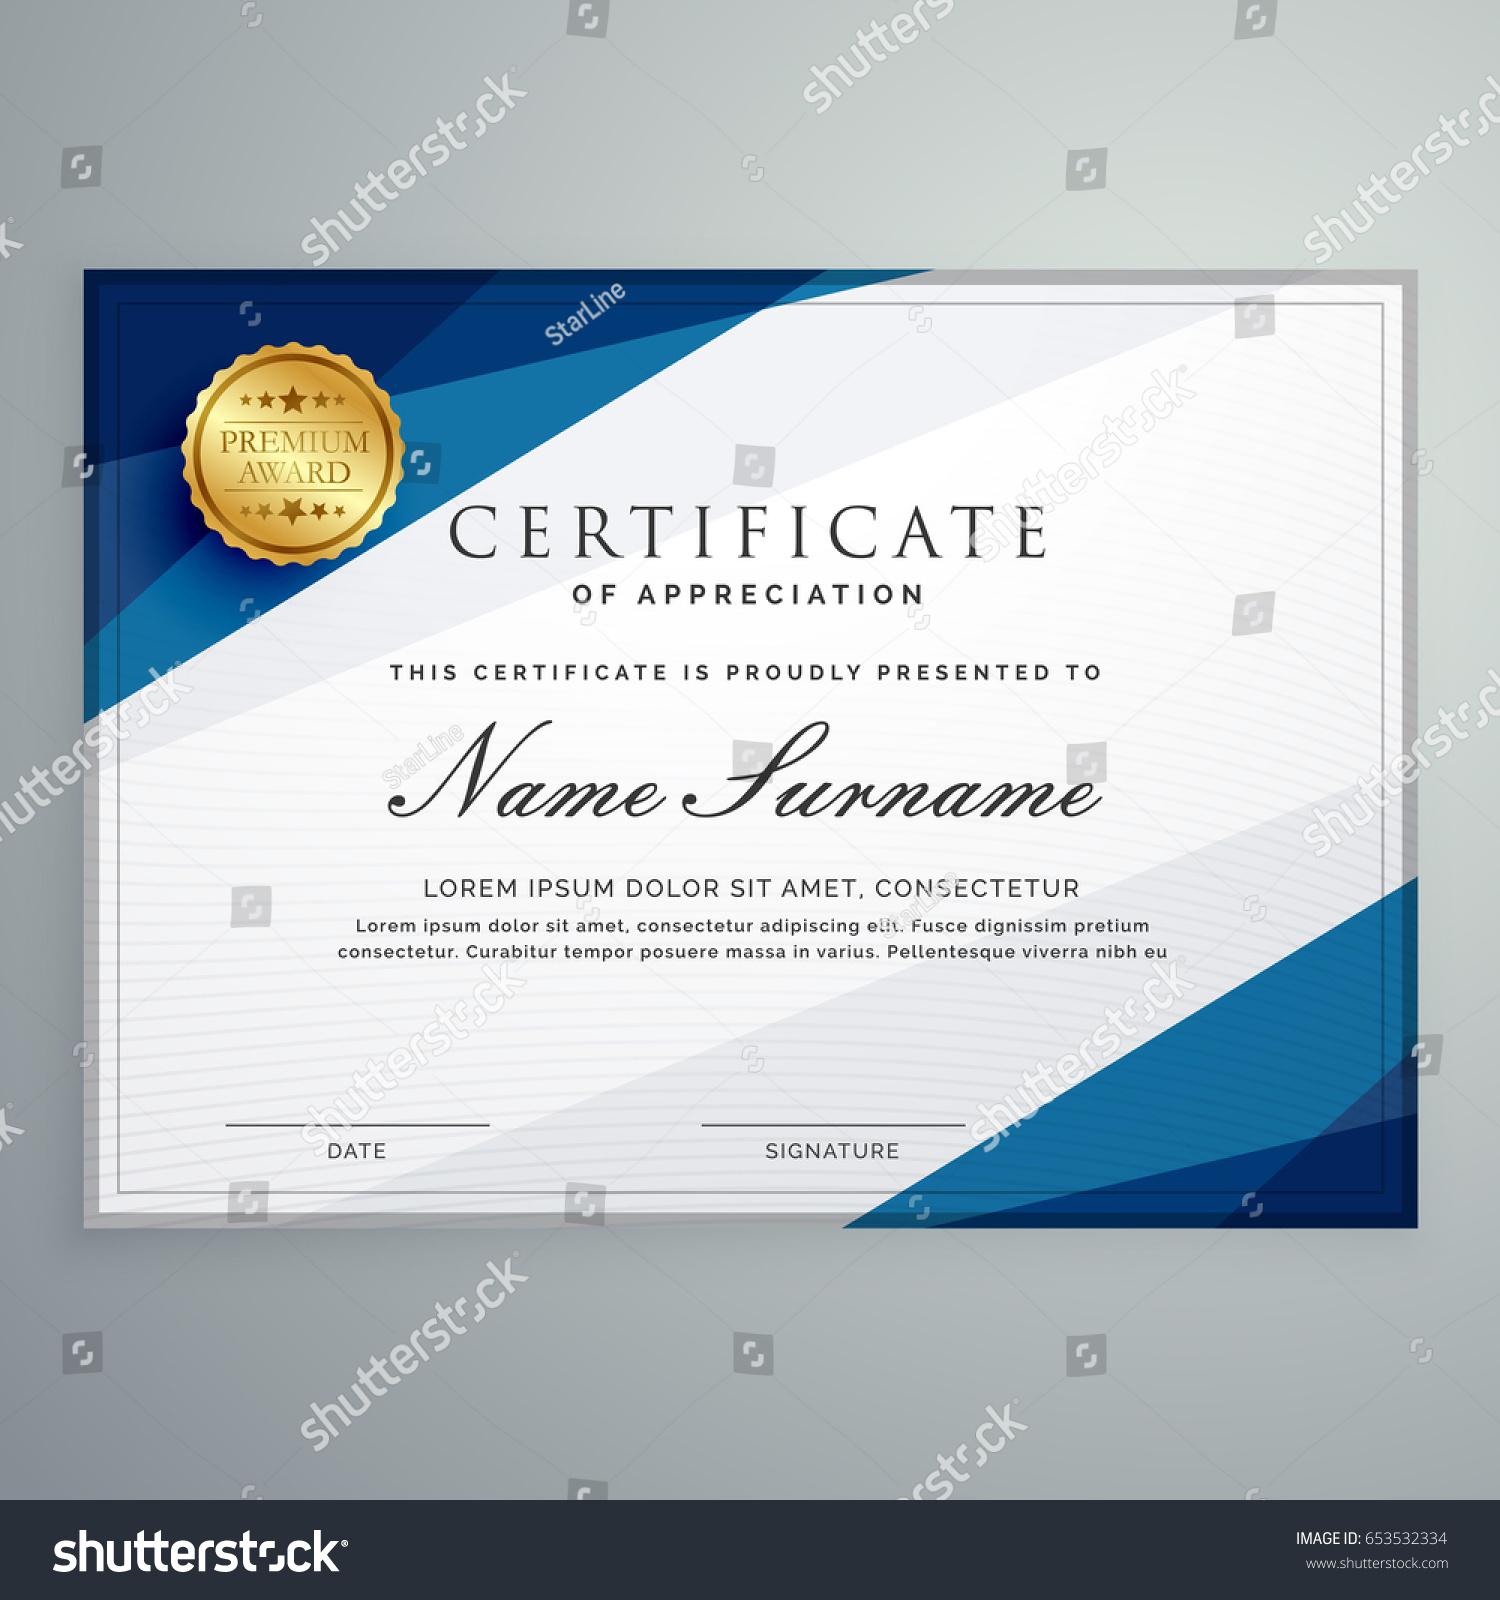 Elegant White Blue Certificate Diploma Template Stock Vector ...